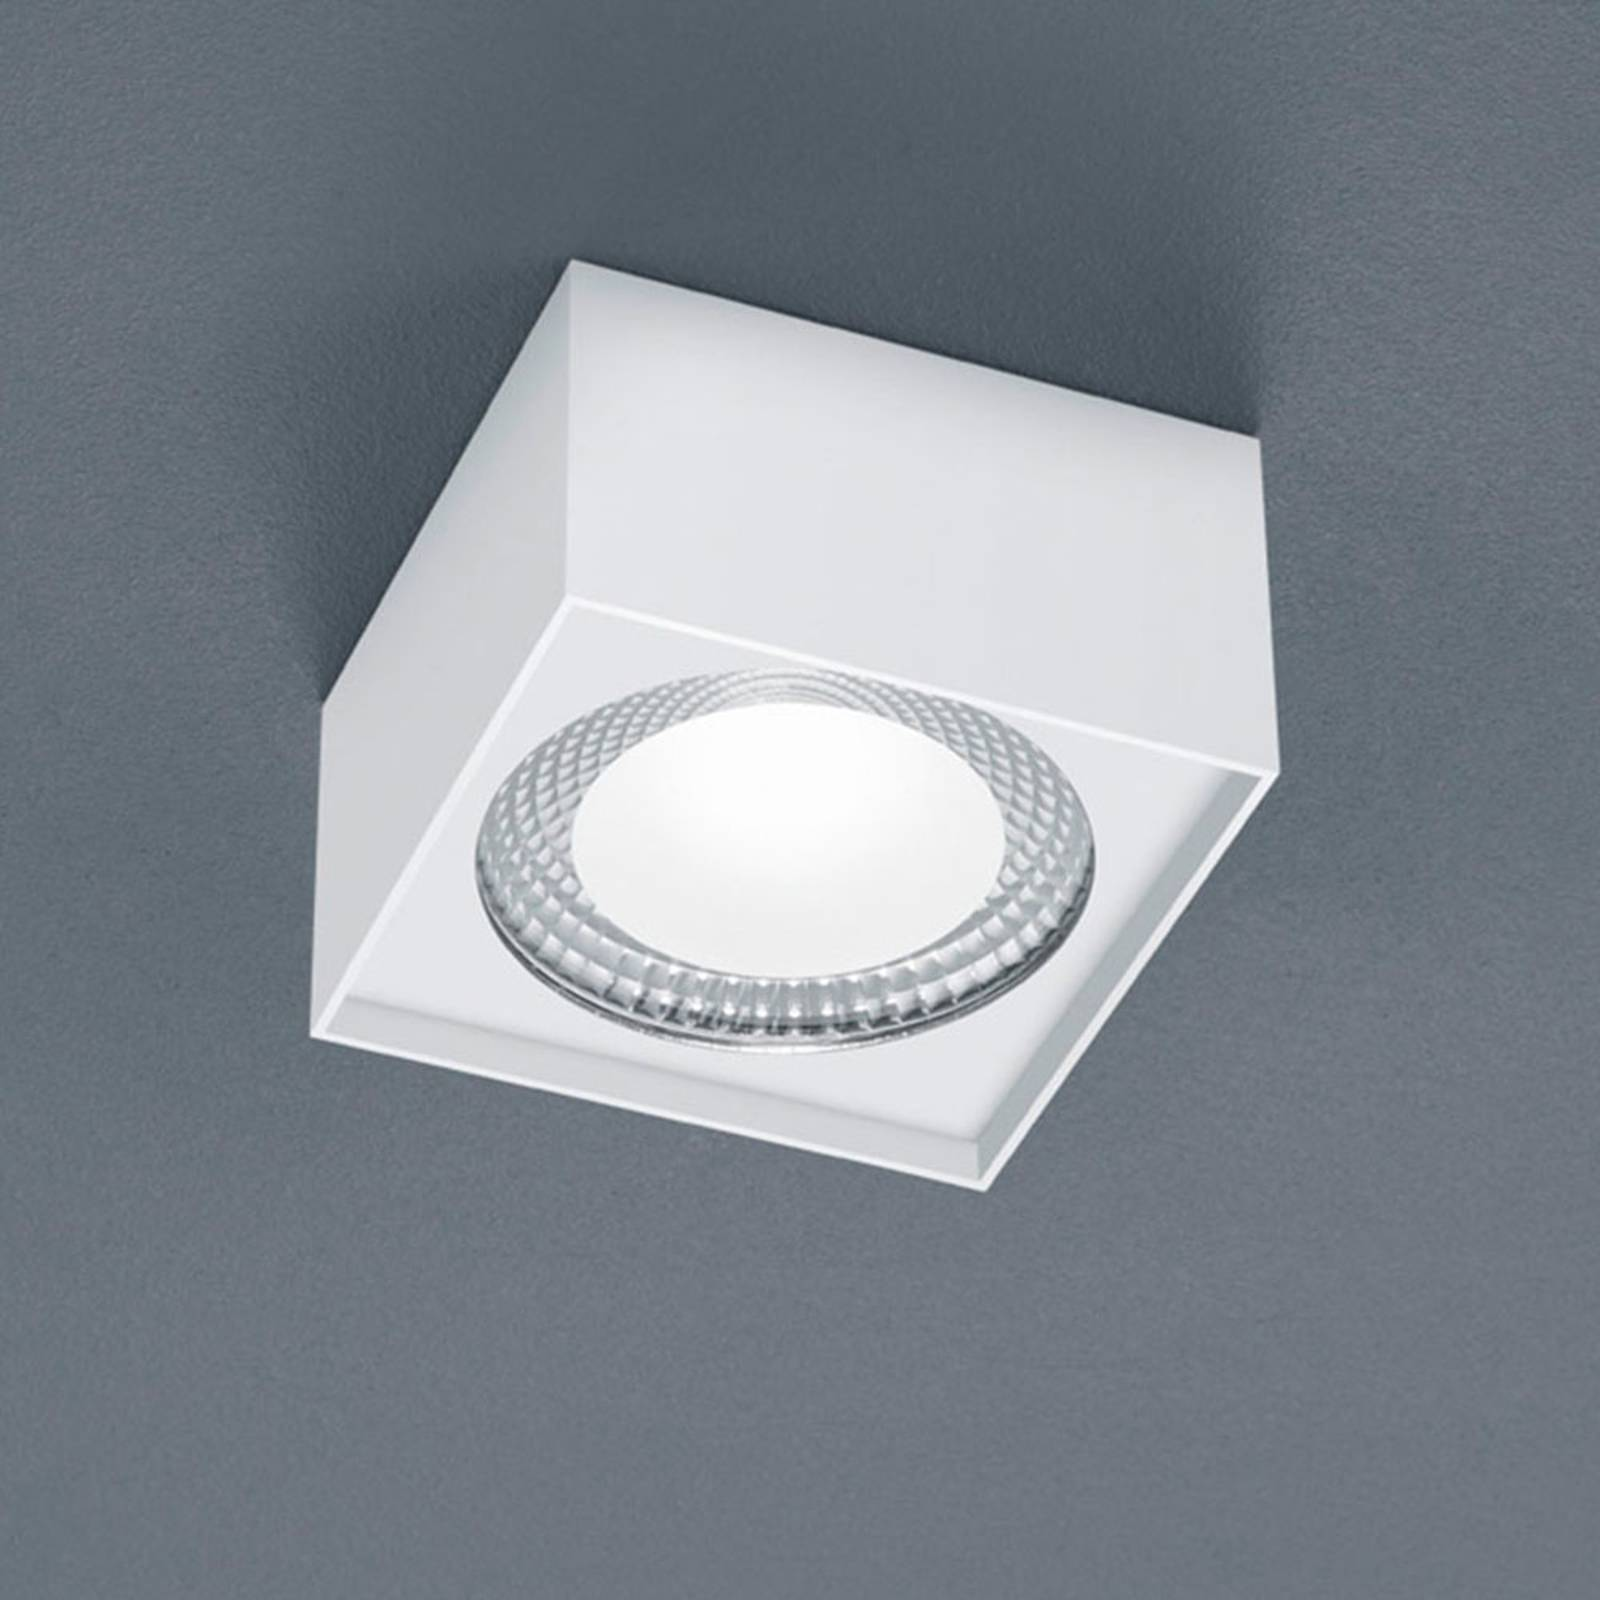 Helestra Kari plafoniera LED, angolare, bianco